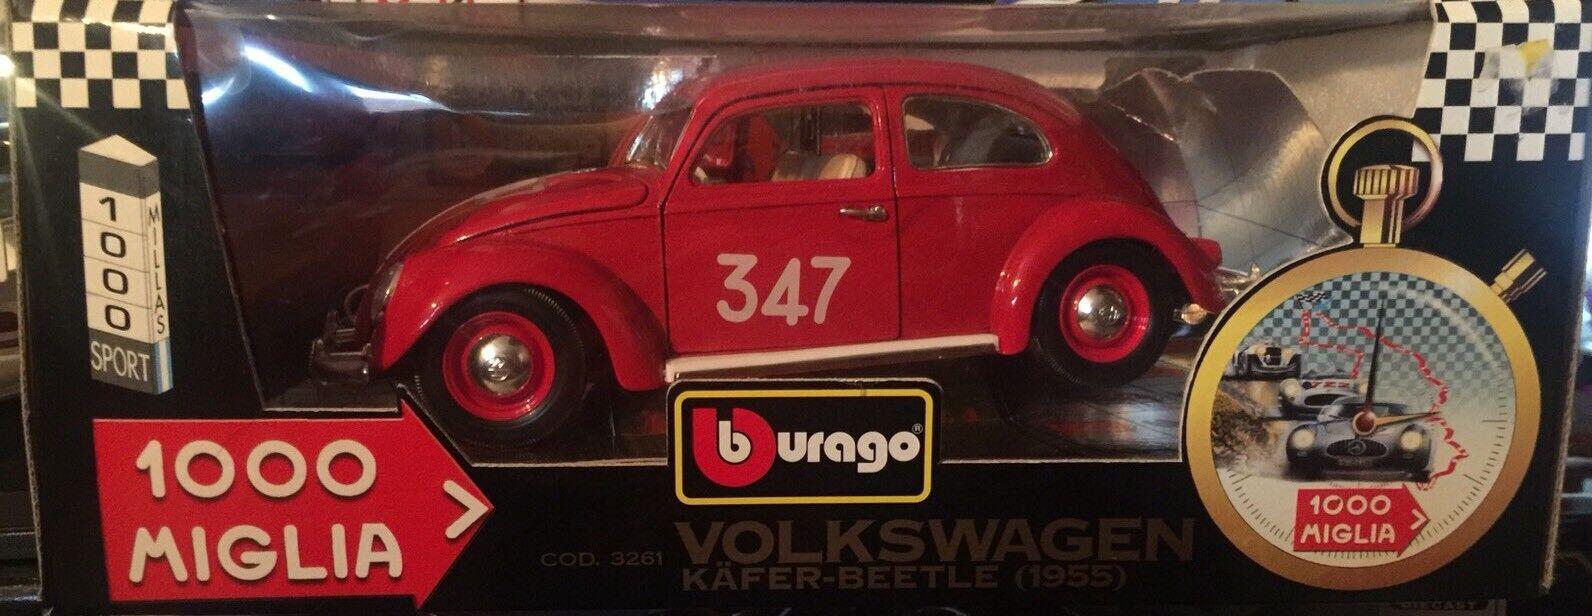 1 18 VW Beetle 1955 Classic German Car Volkswagen Beetle 1 18